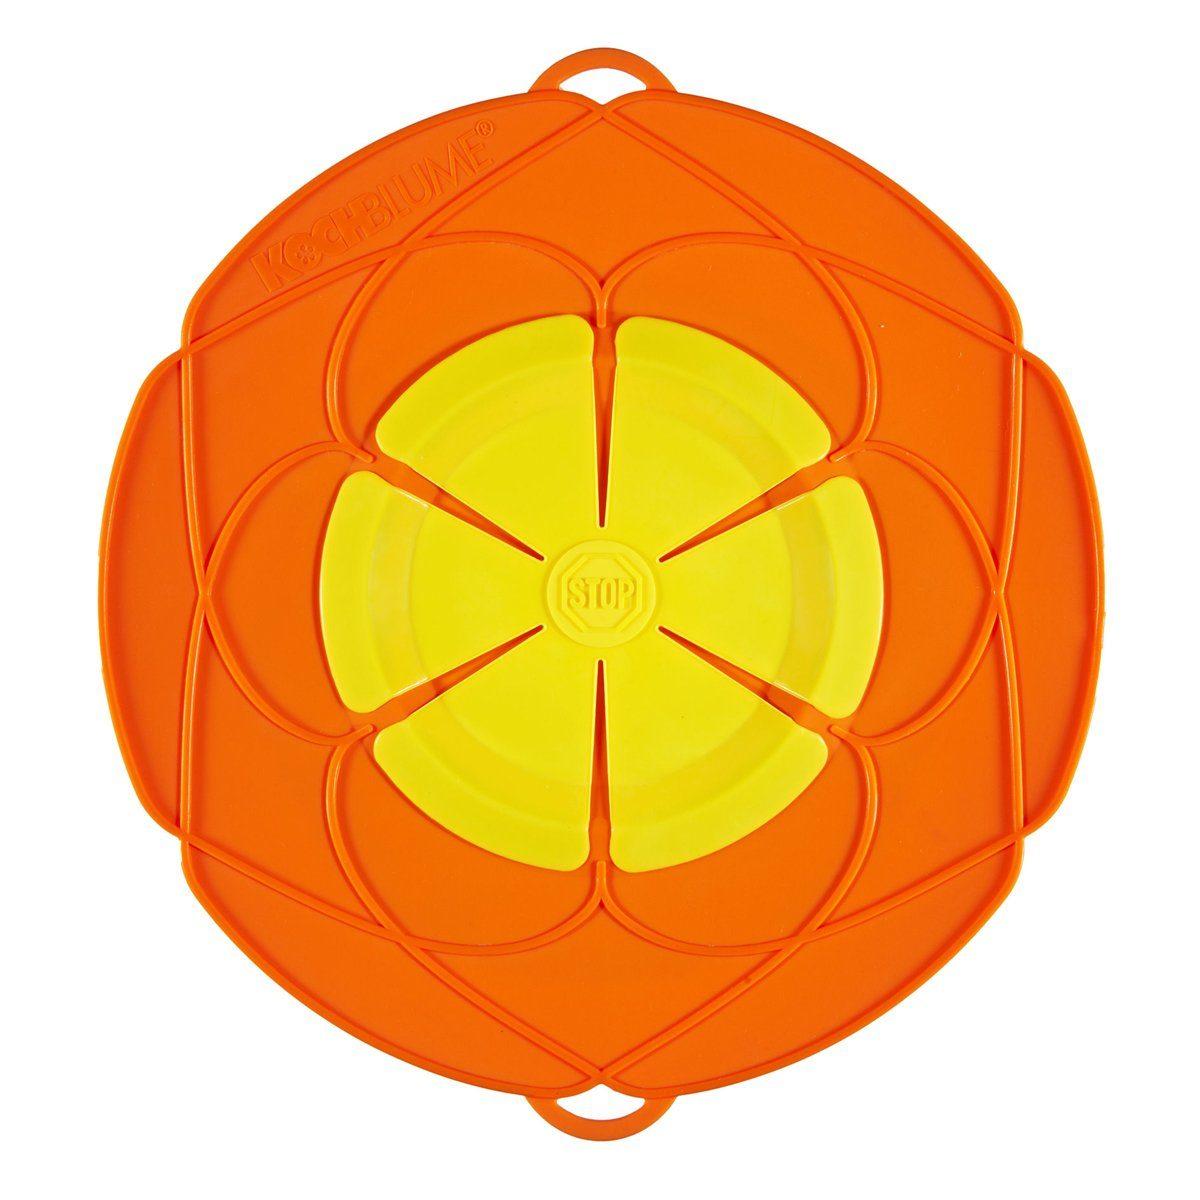 Kochblume Kochblume Überkochschutz orange 25.5 cm